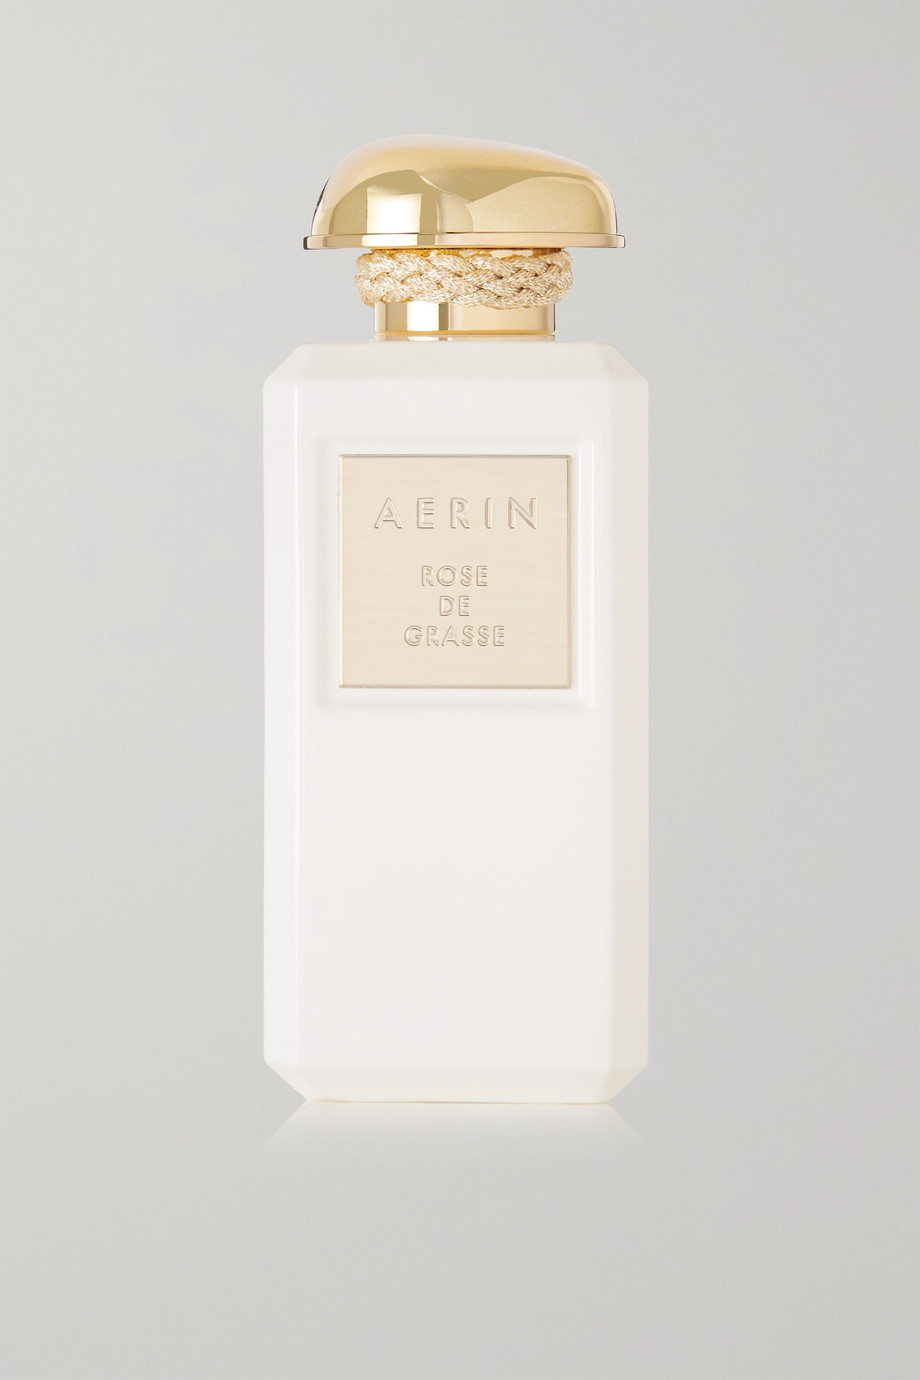 AERIN Beauty Rose De Grasse Parfum - Rose Centifolia, Rose Otto Bulgarian & Rose Absolute, 100ml